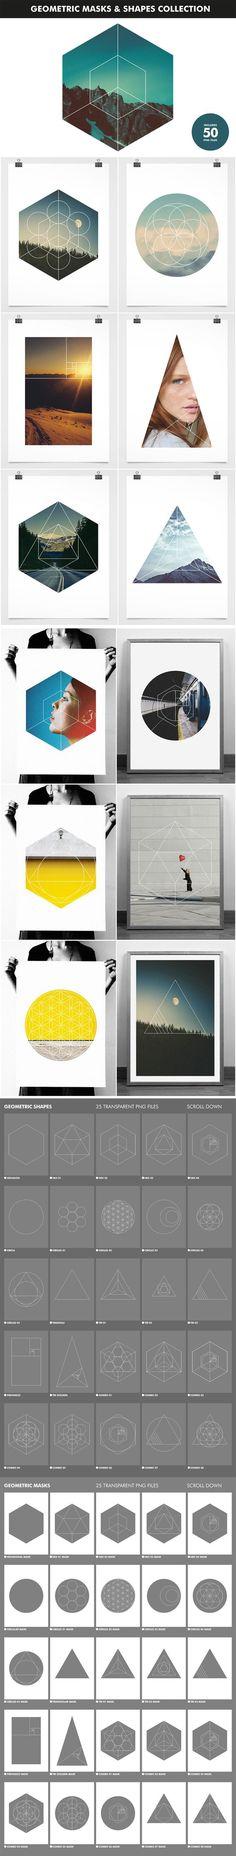 máscaras geométricas & coleção formatos Geometric Masks and Shapes Collection: